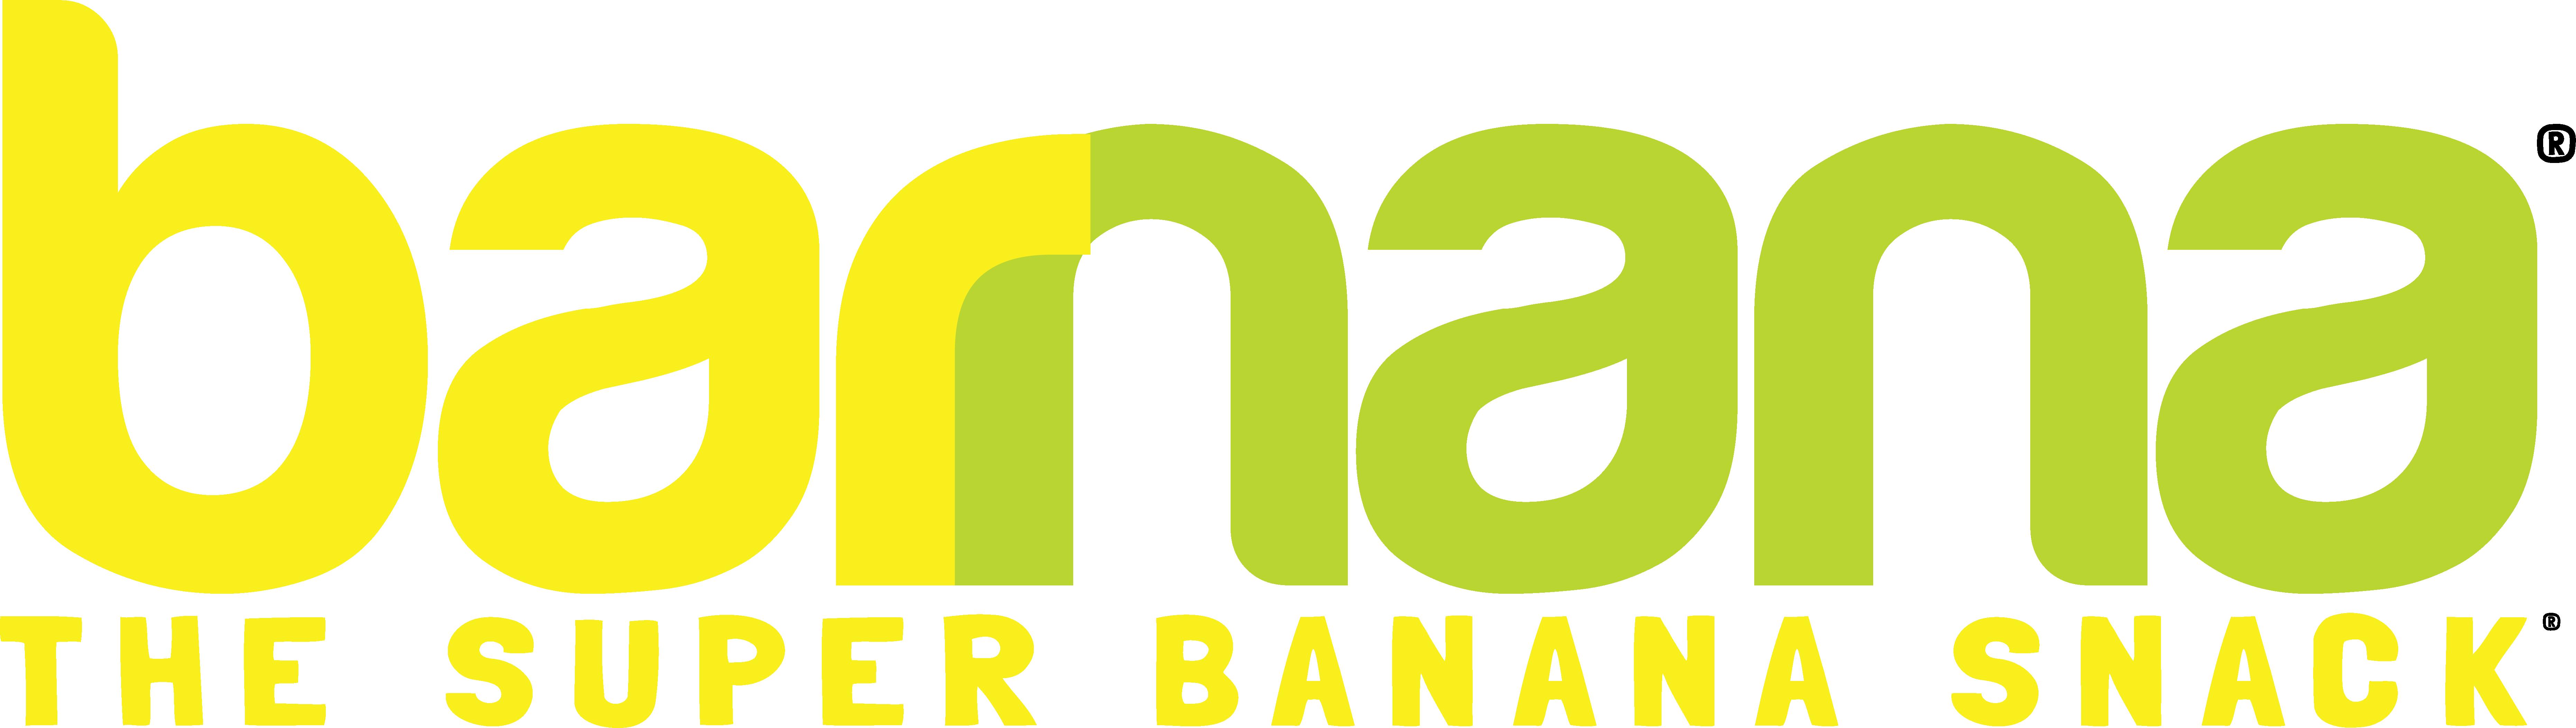 Barnana   logo   yellow  green